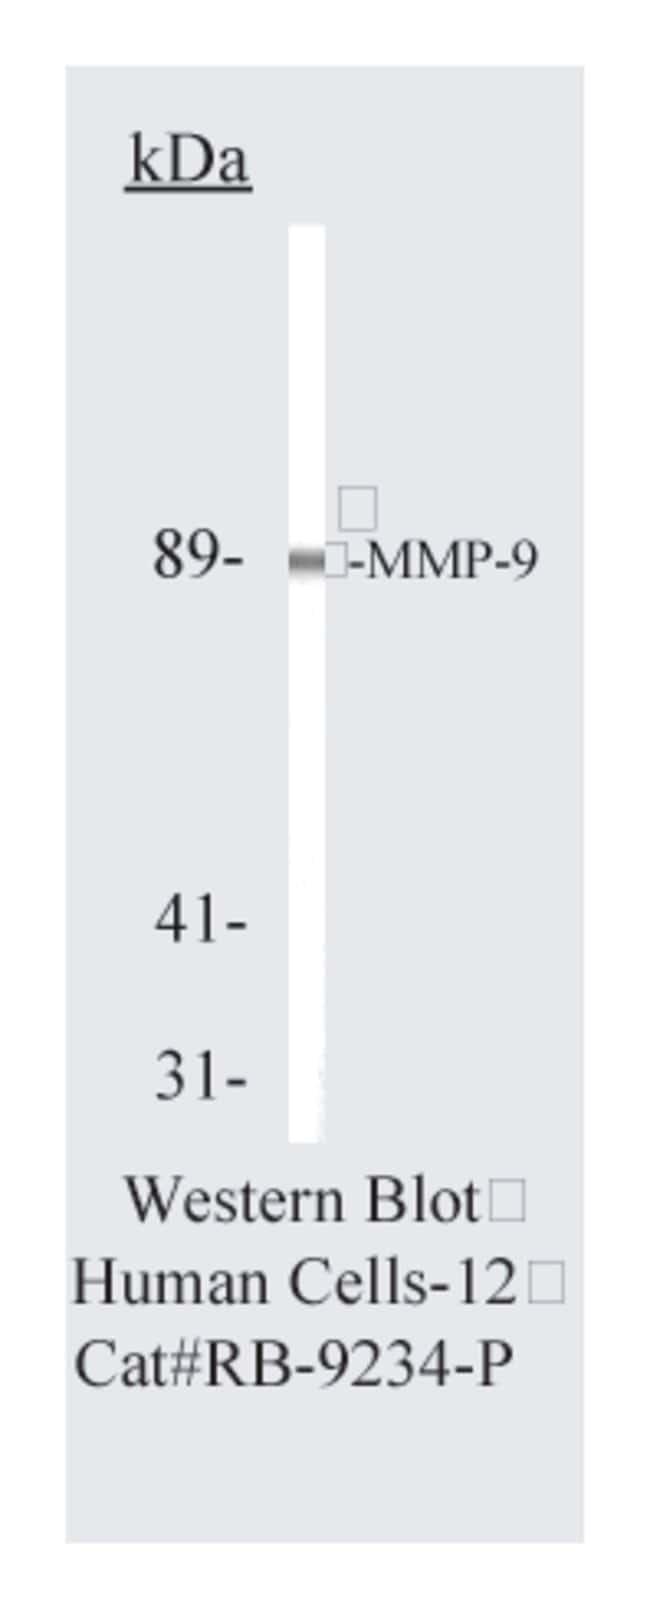 Thermo Scientific Lab Vision MMP-9 (92kDa Collagenase IV), Rabbit Polyclonal